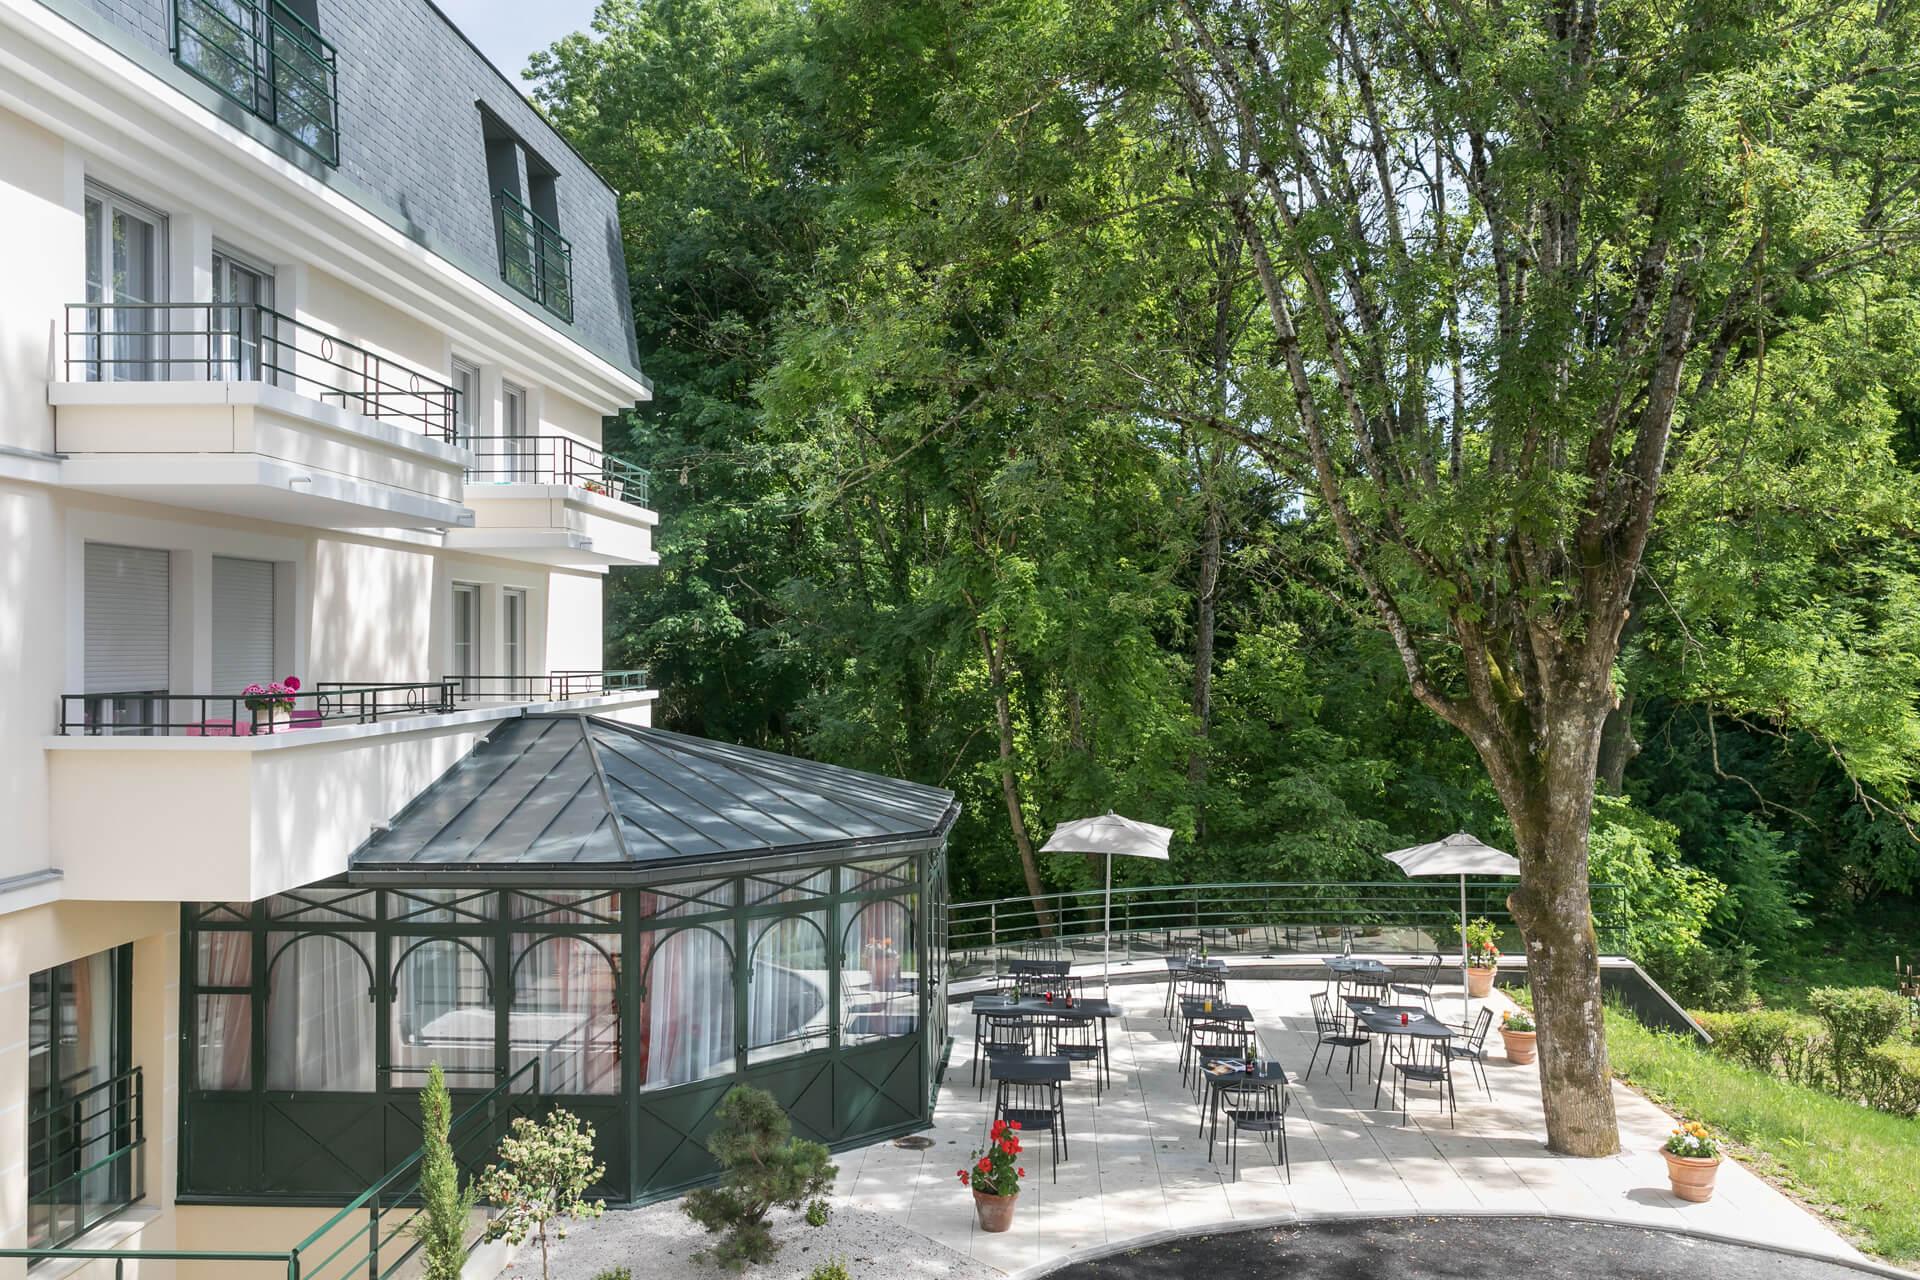 Les Jardins D'arcadie Dijon - Dijon à Tarif Les Jardins D Arcadie